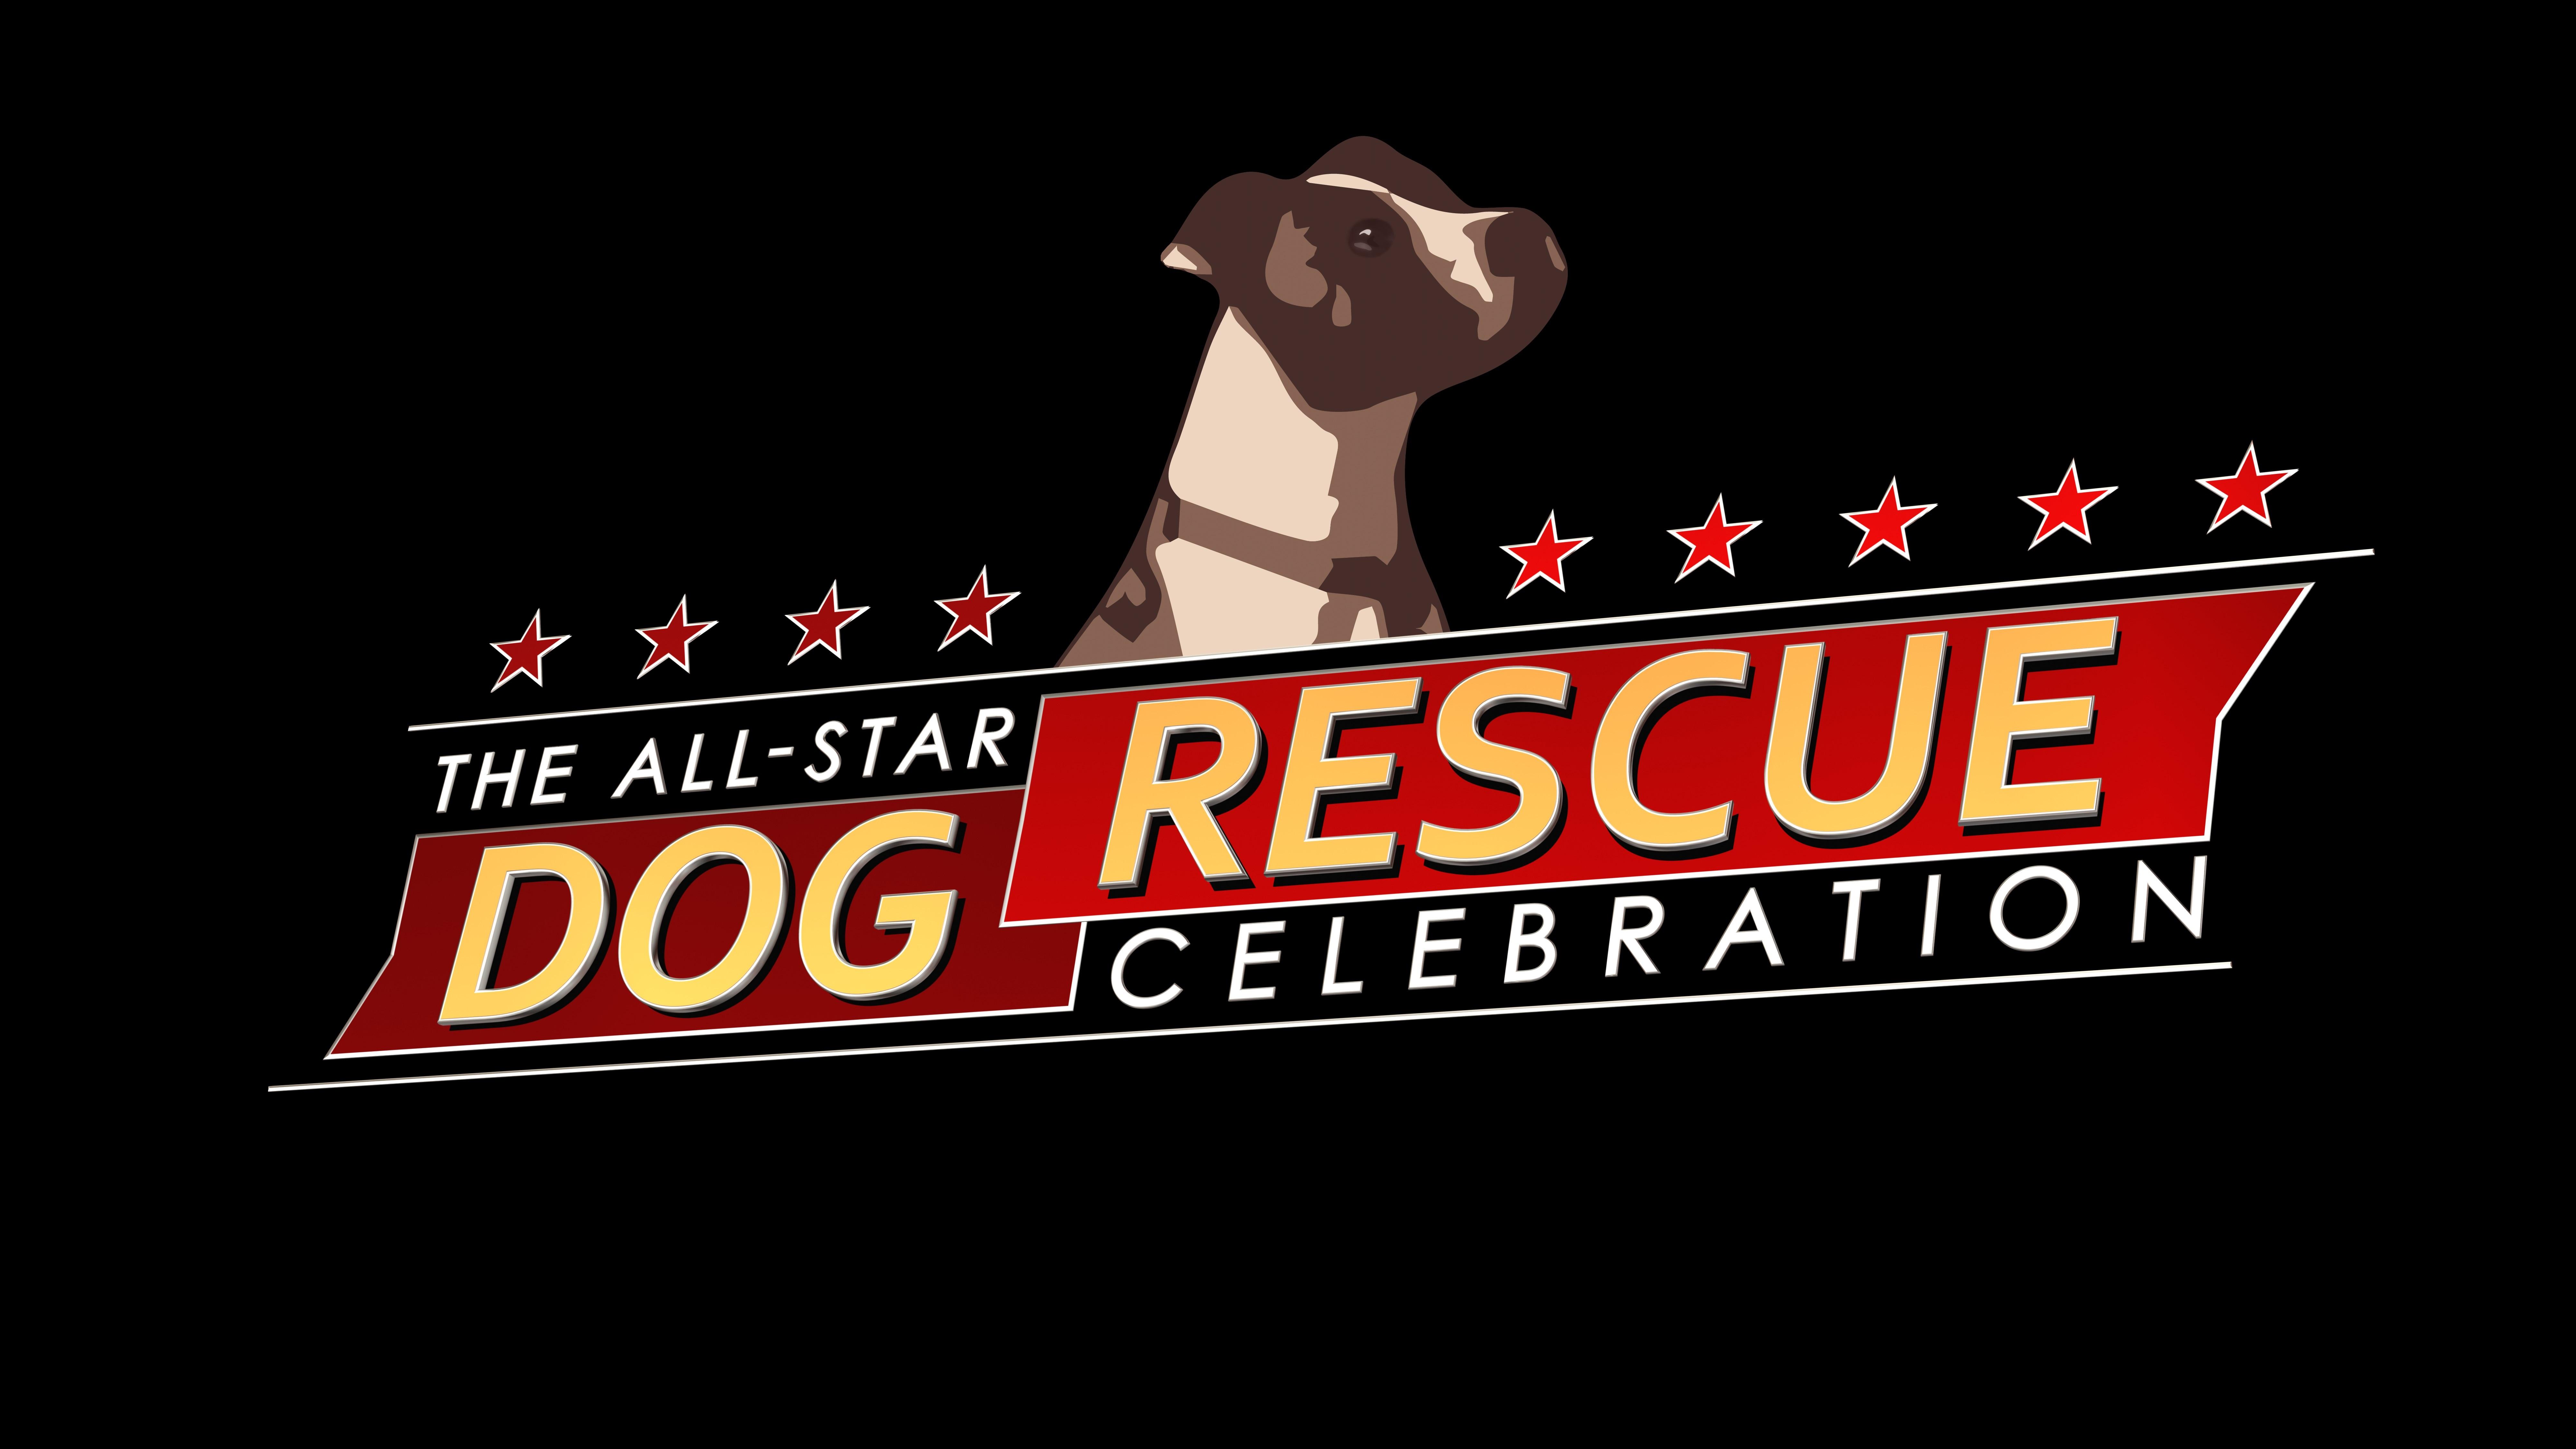 Dog_Rescue_Final_8k-0